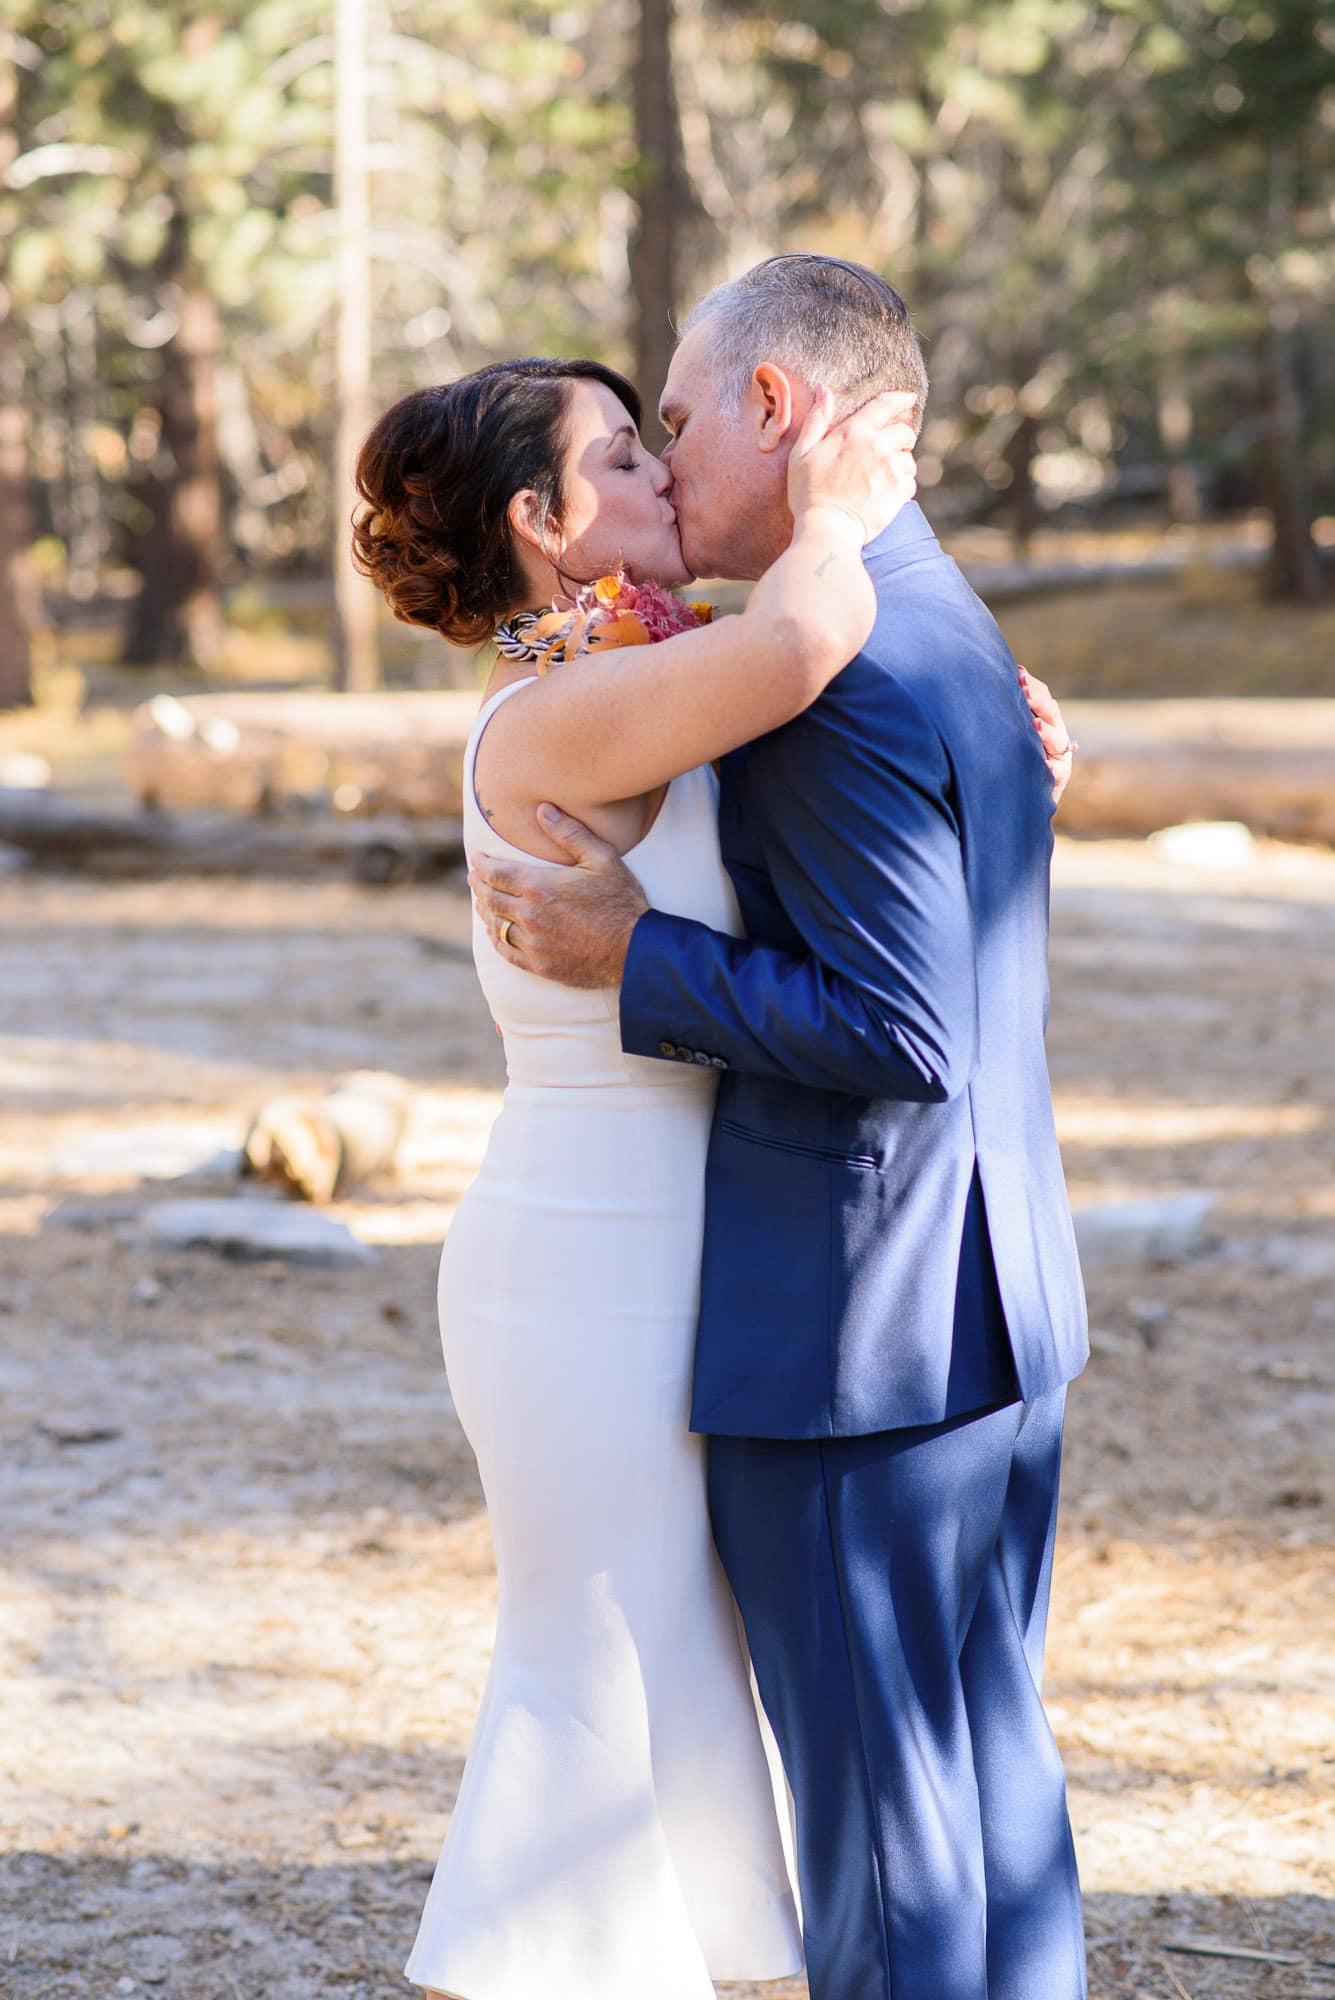 026_Alan_and_Heidi_Palm_Springs_Tram_Wedding